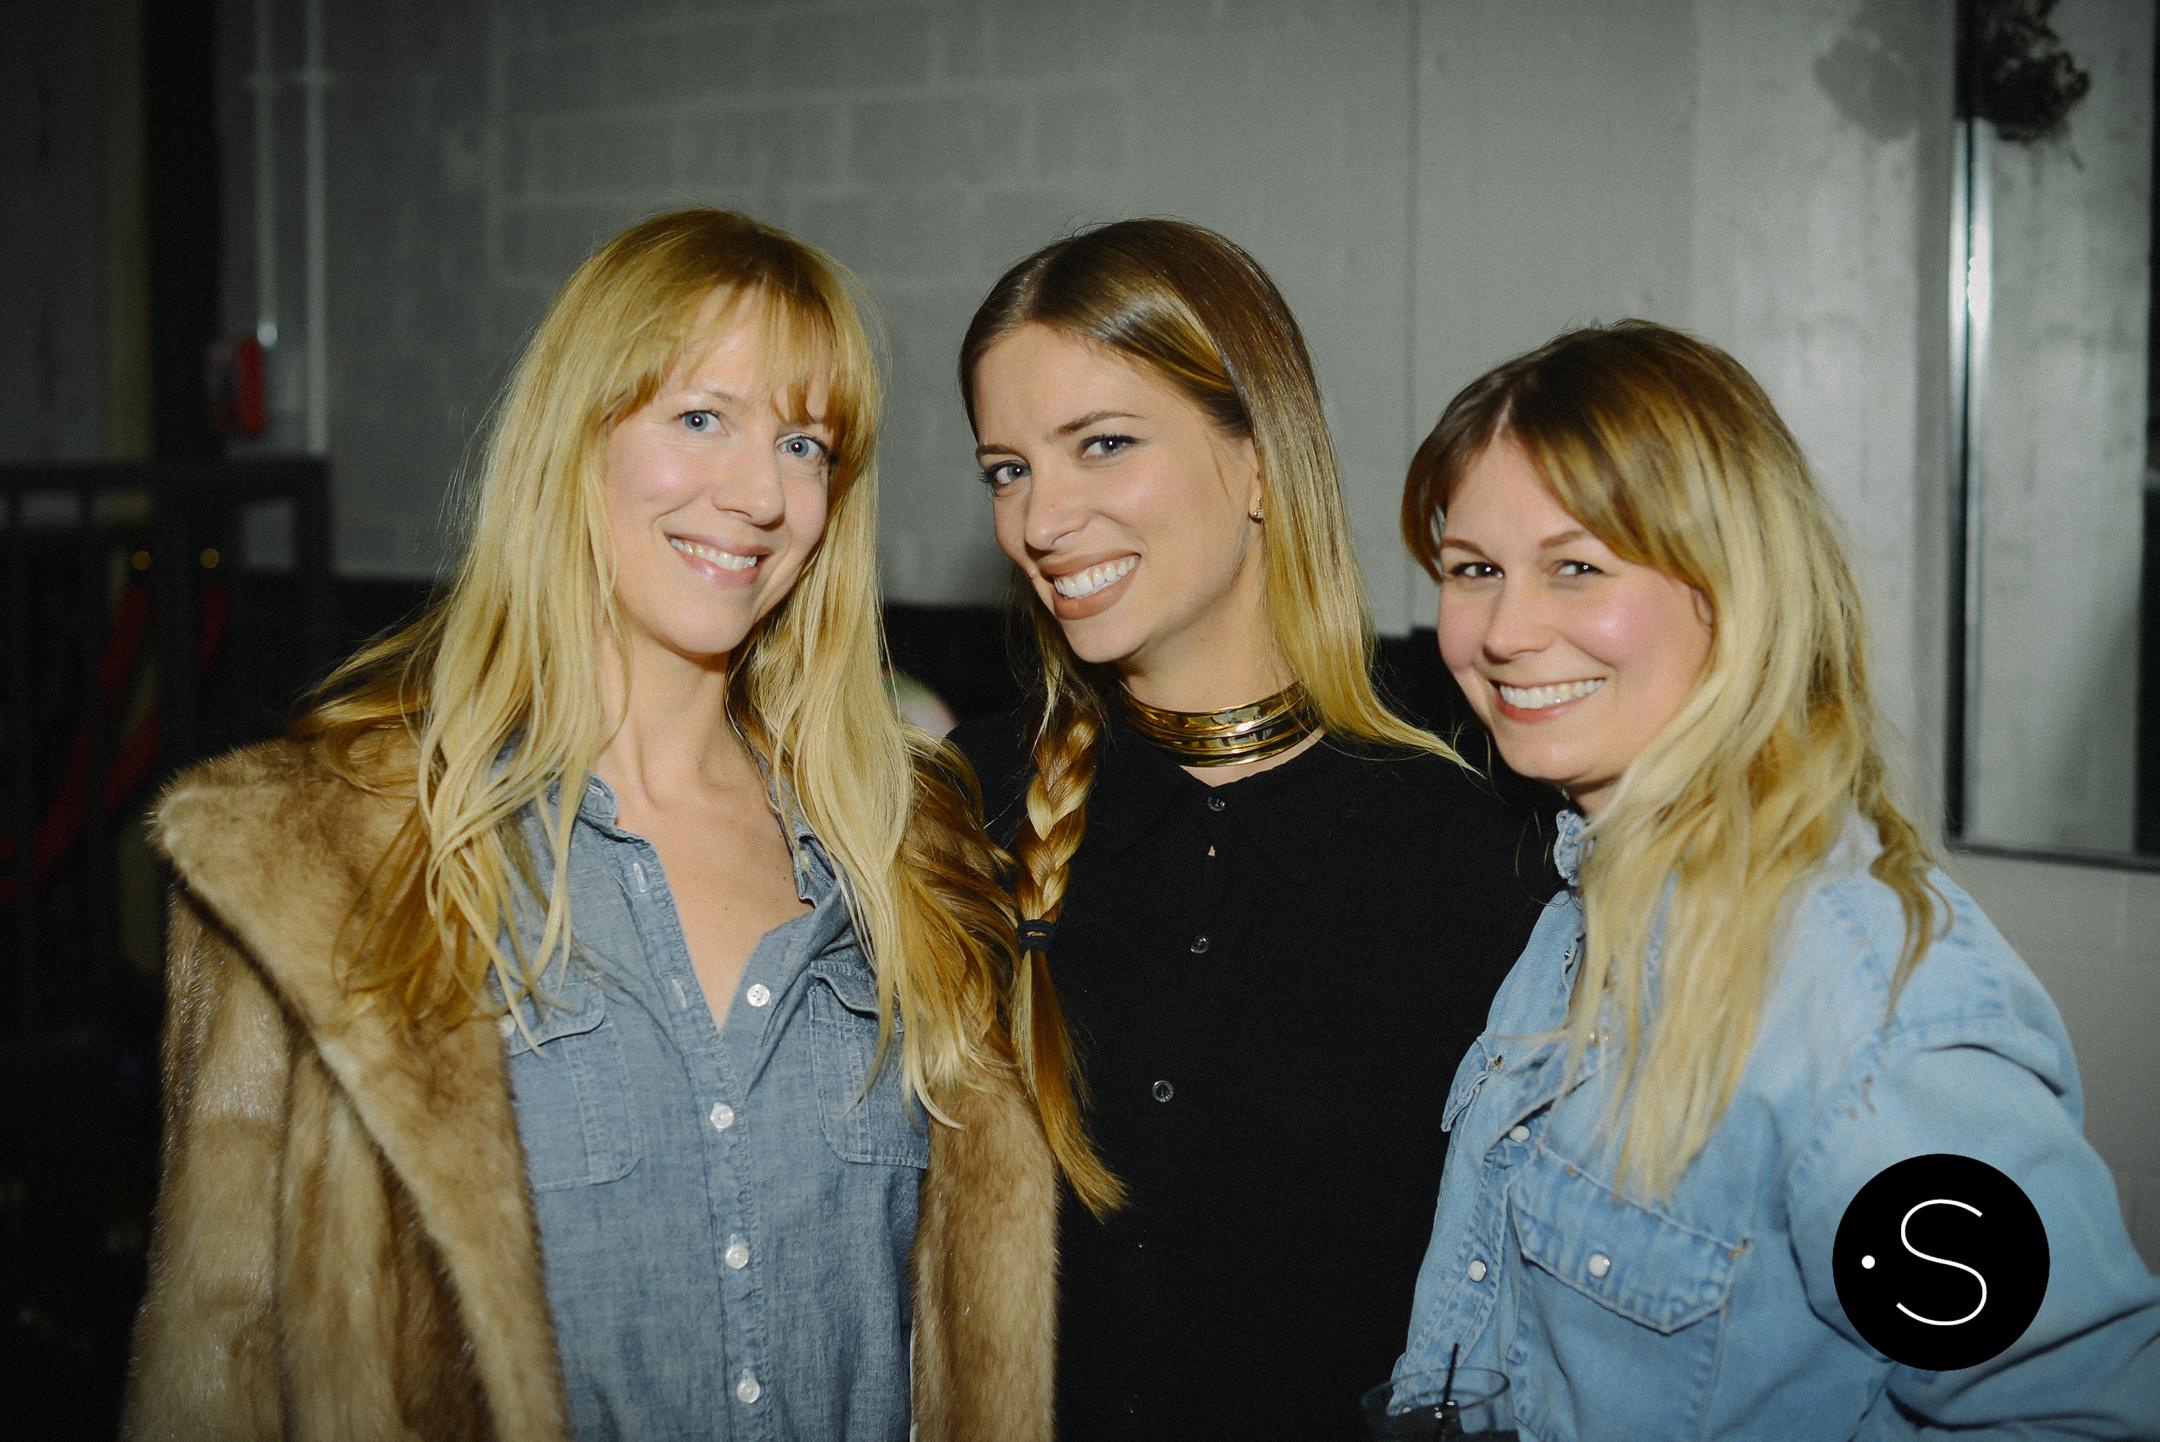 Amanda Valentine with her friends